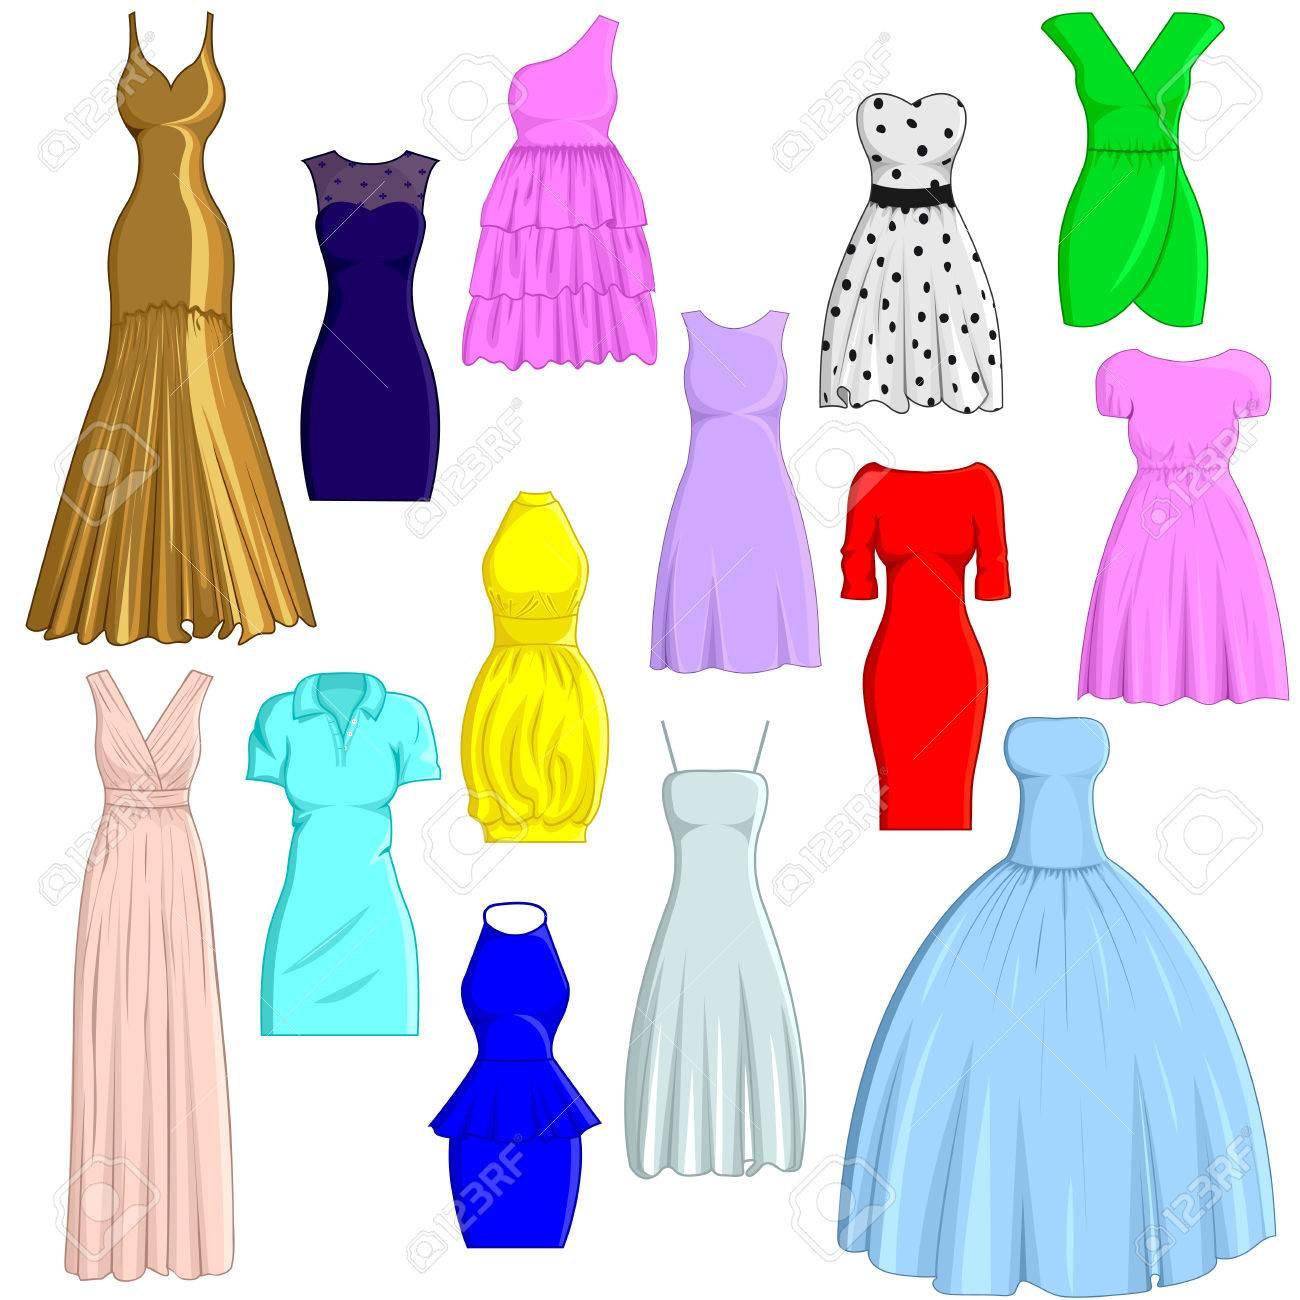 a set of dresses